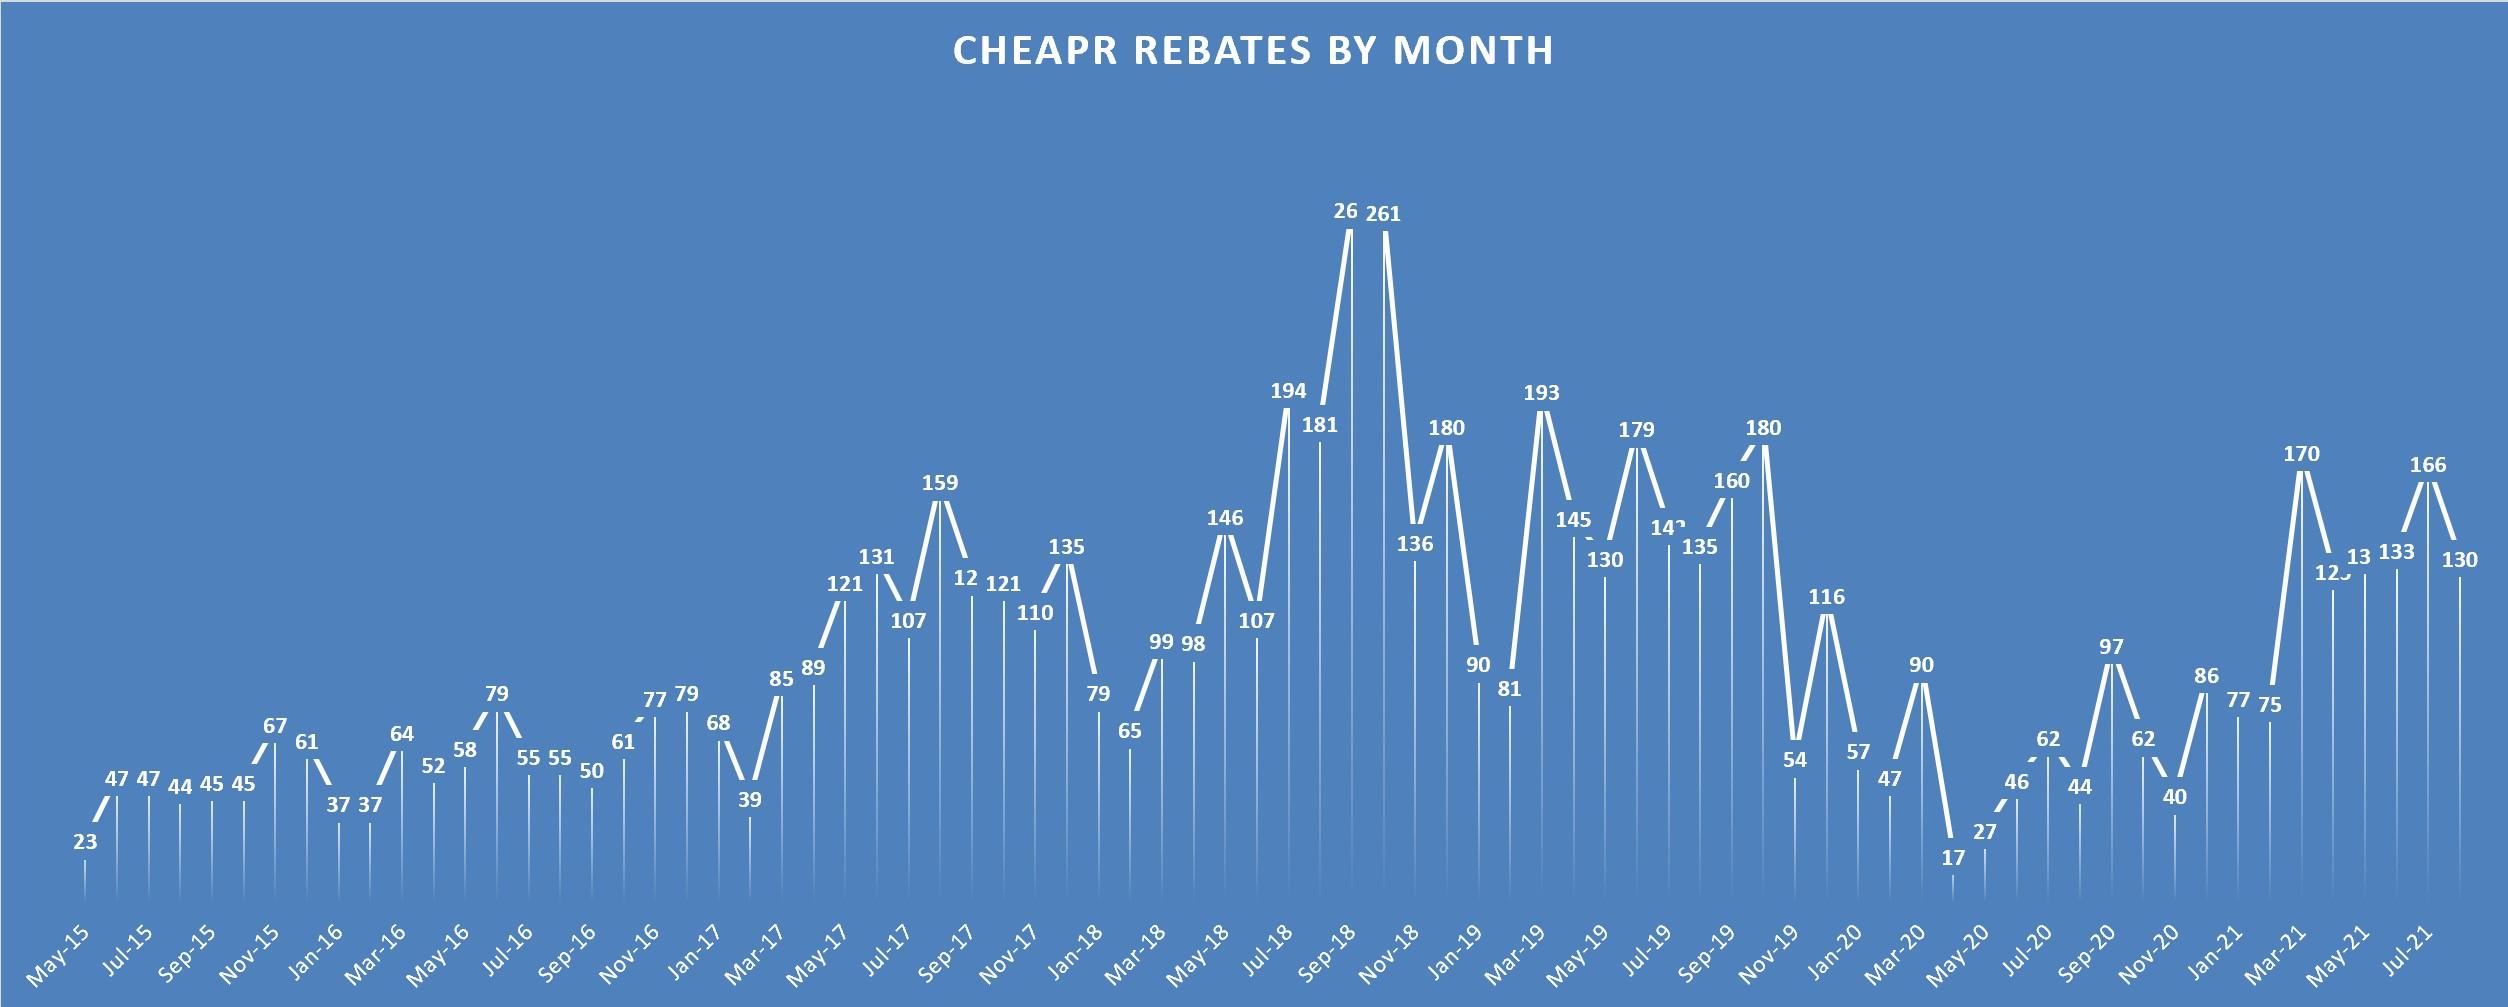 CHEAPR rebates by month through August 2021